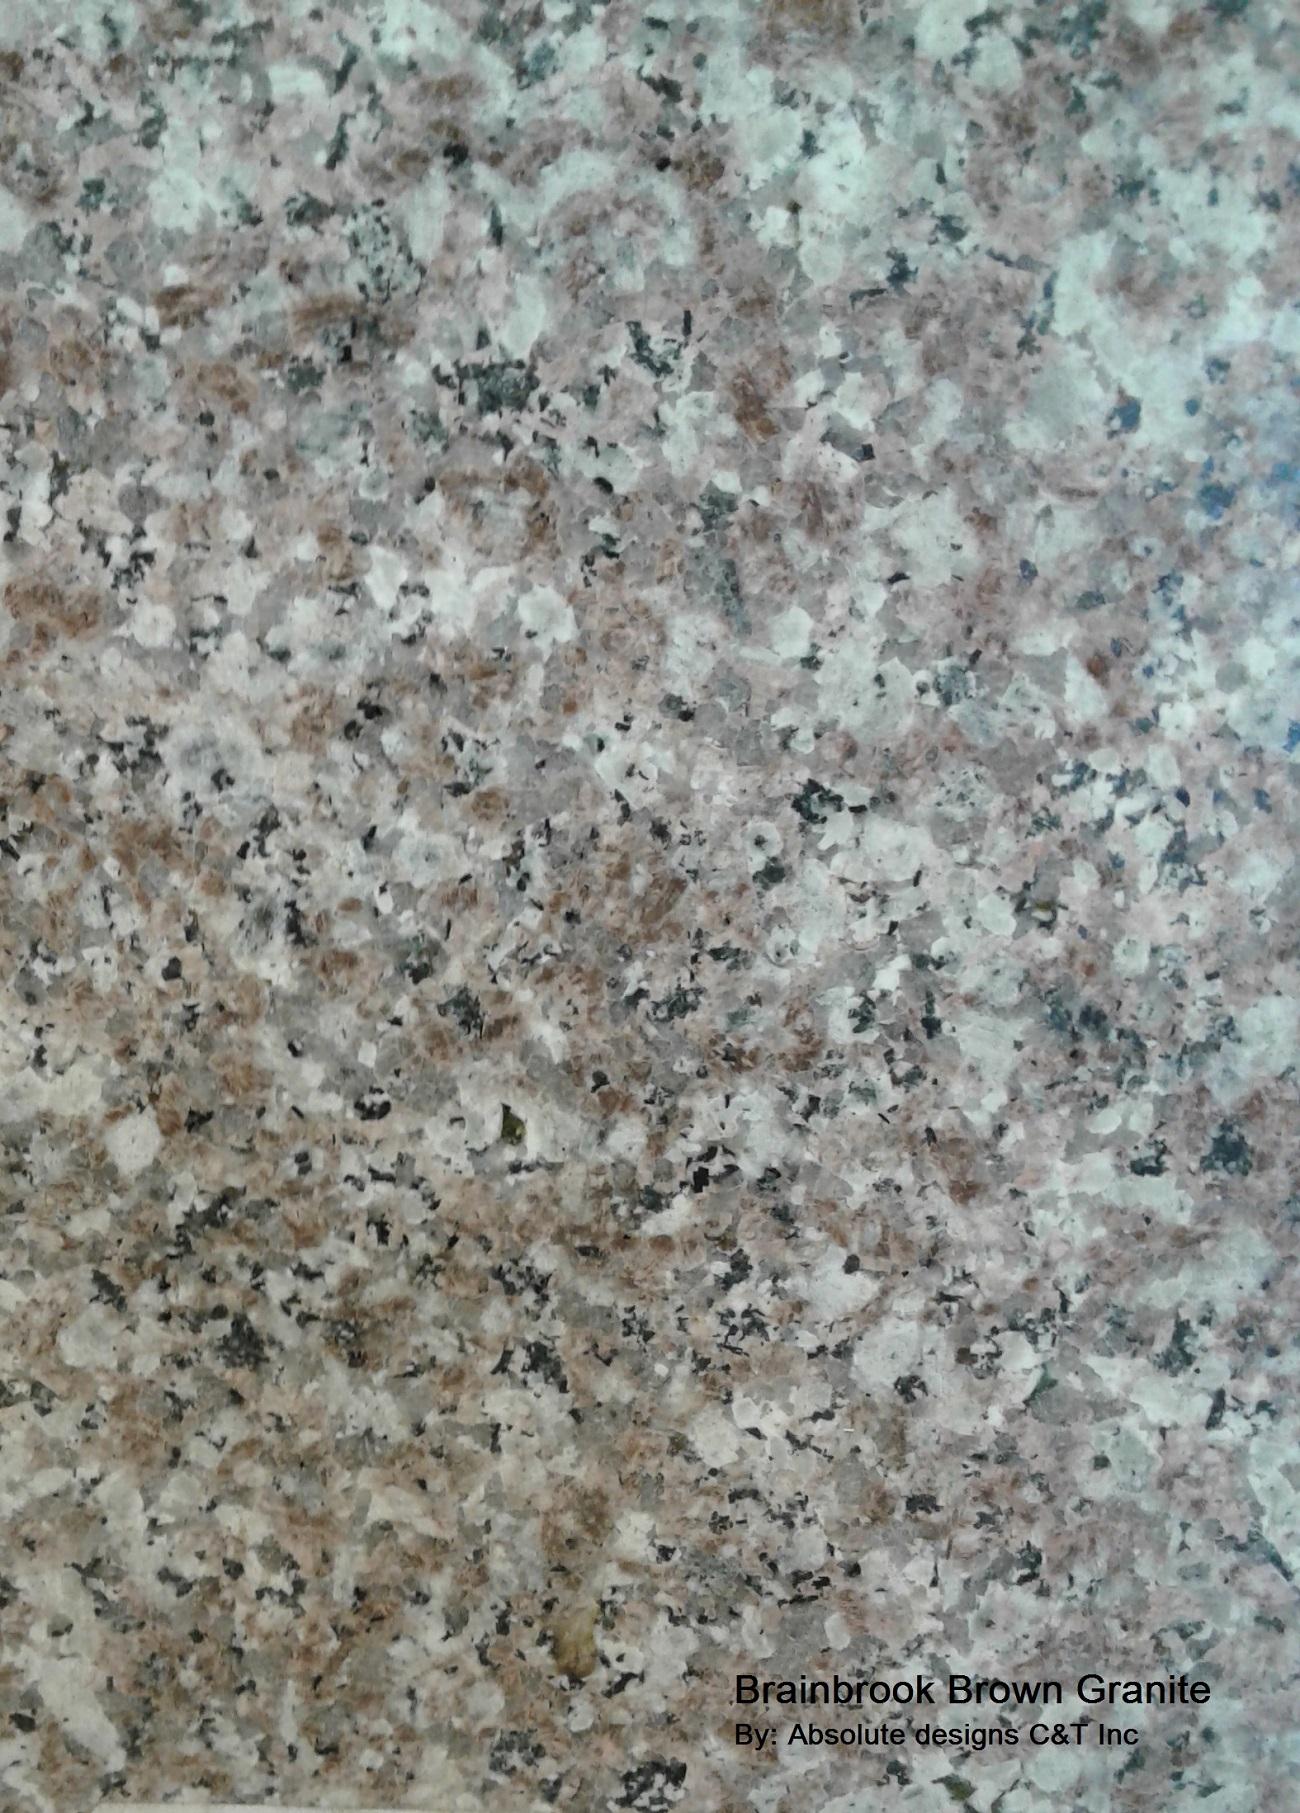 granite countertop great dutt countertops v saura colors kitchen stones for